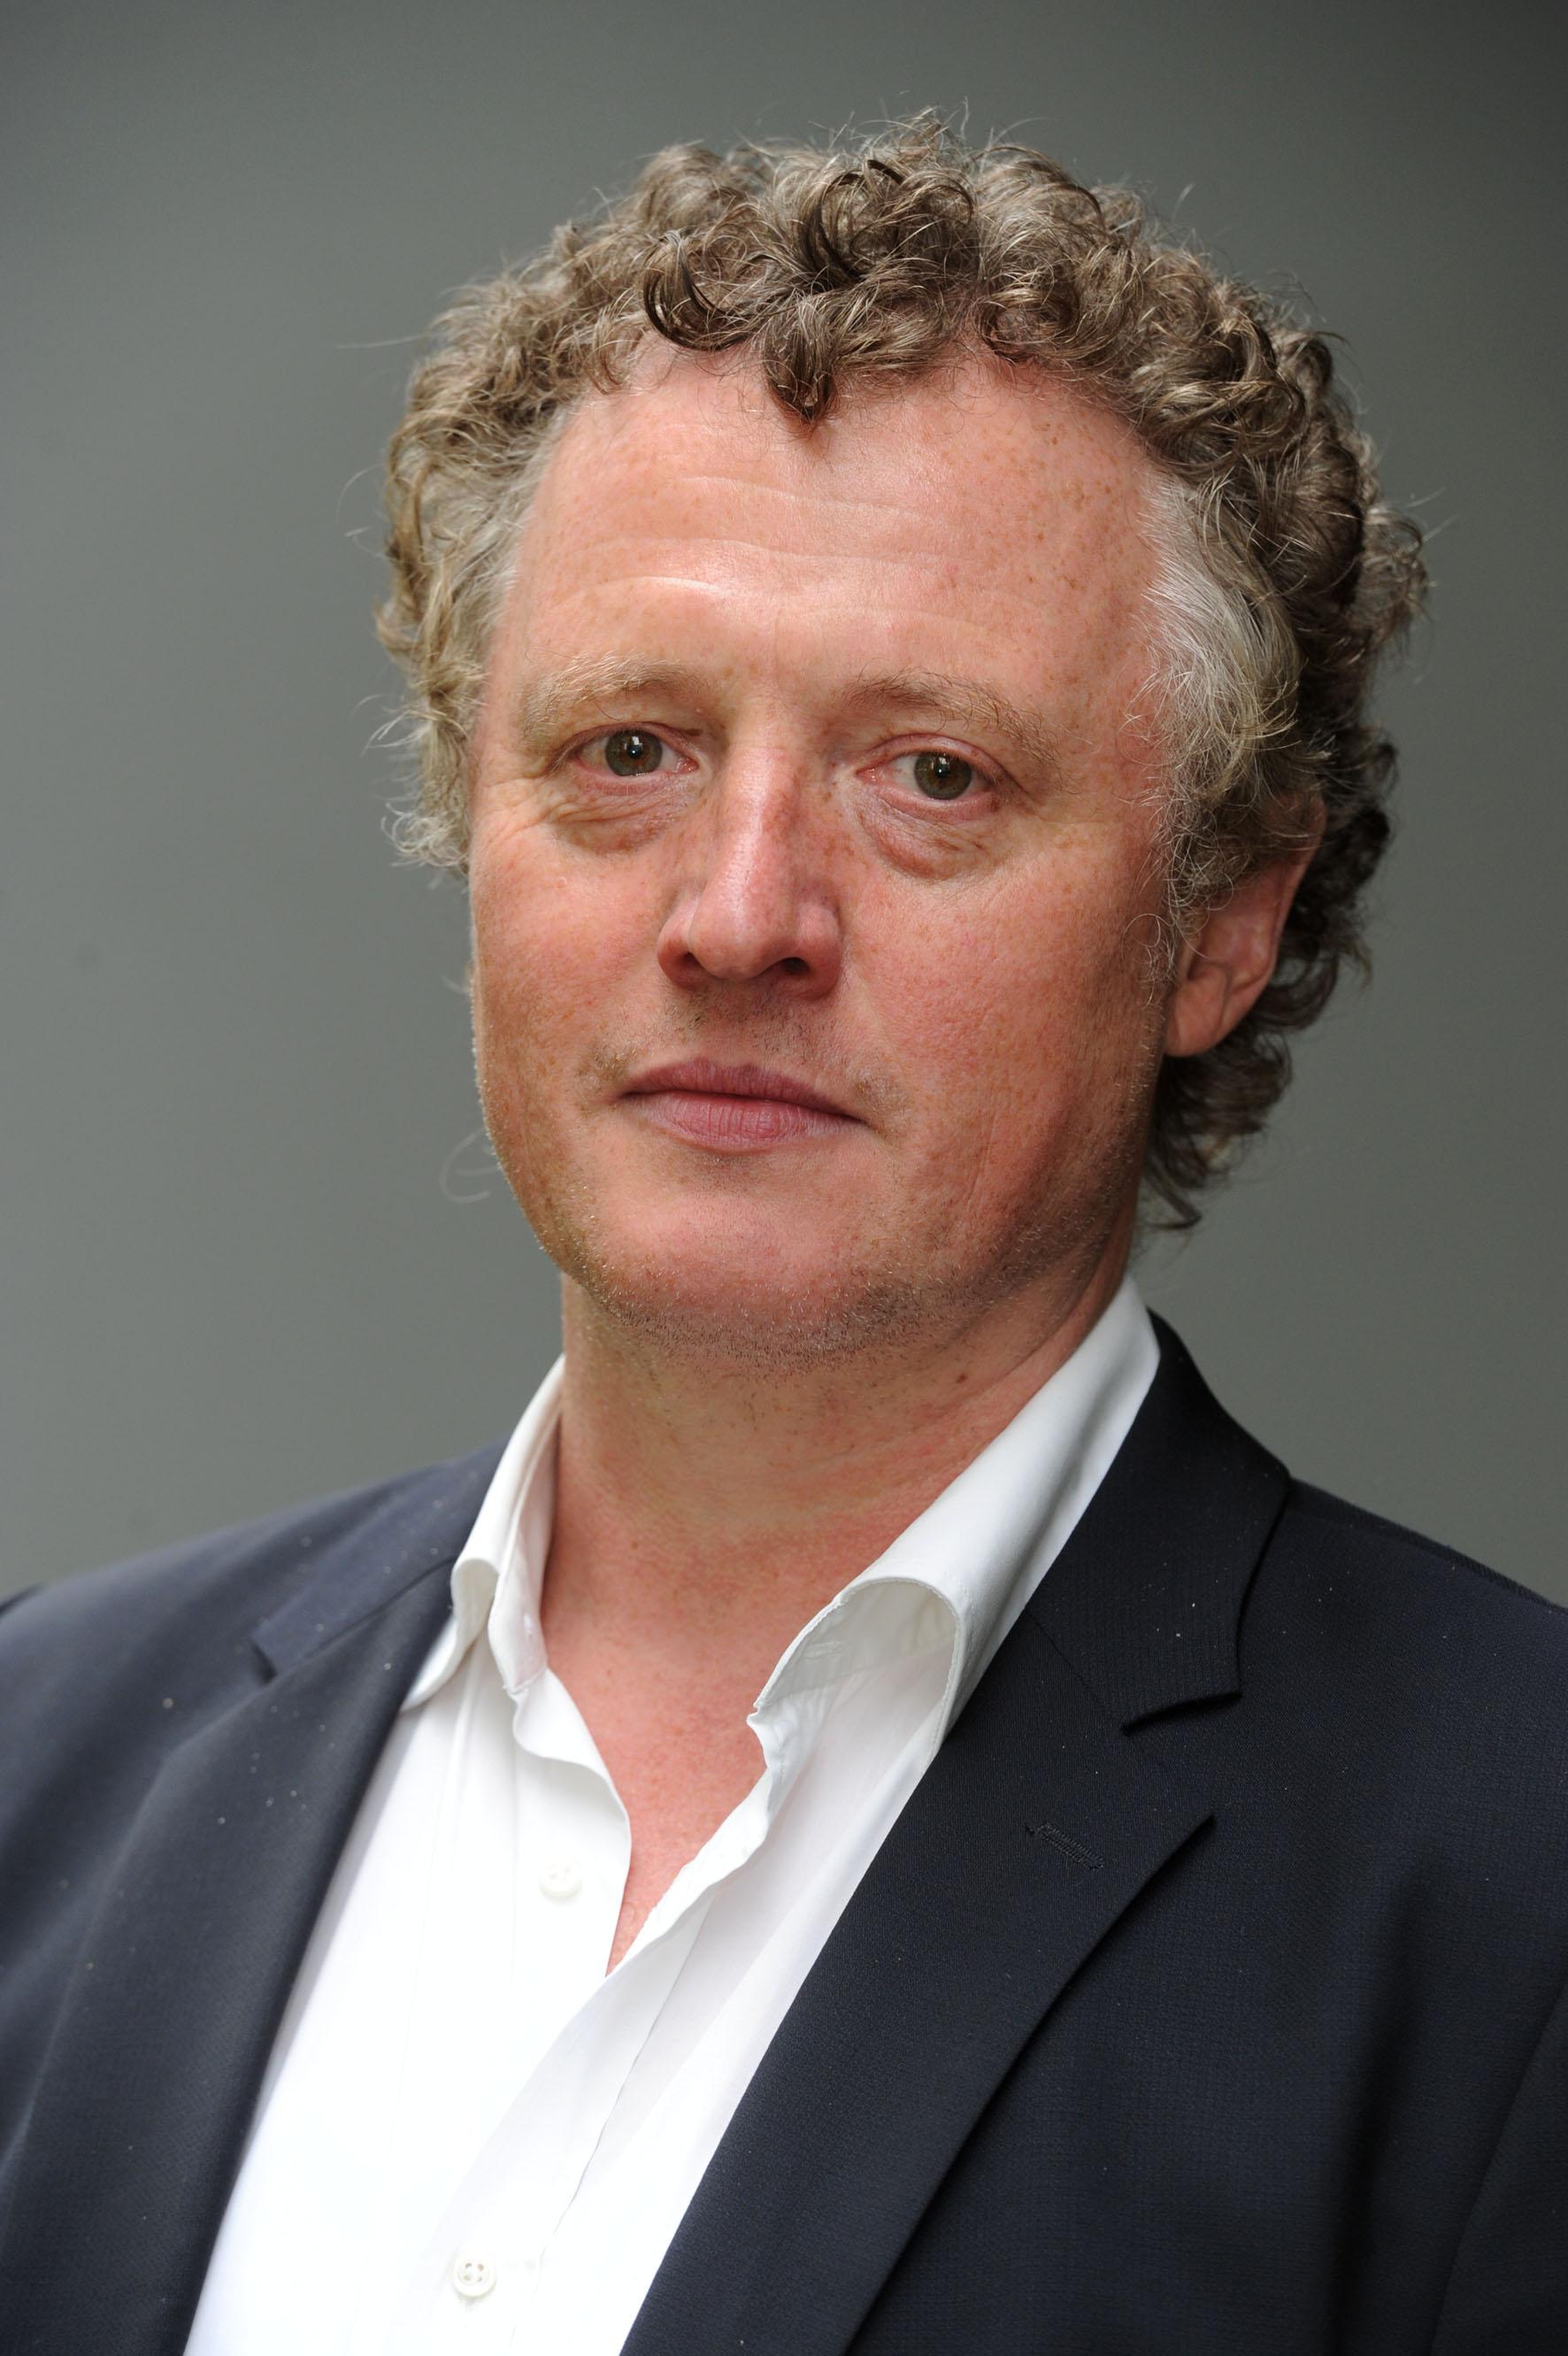 Josef Lederle